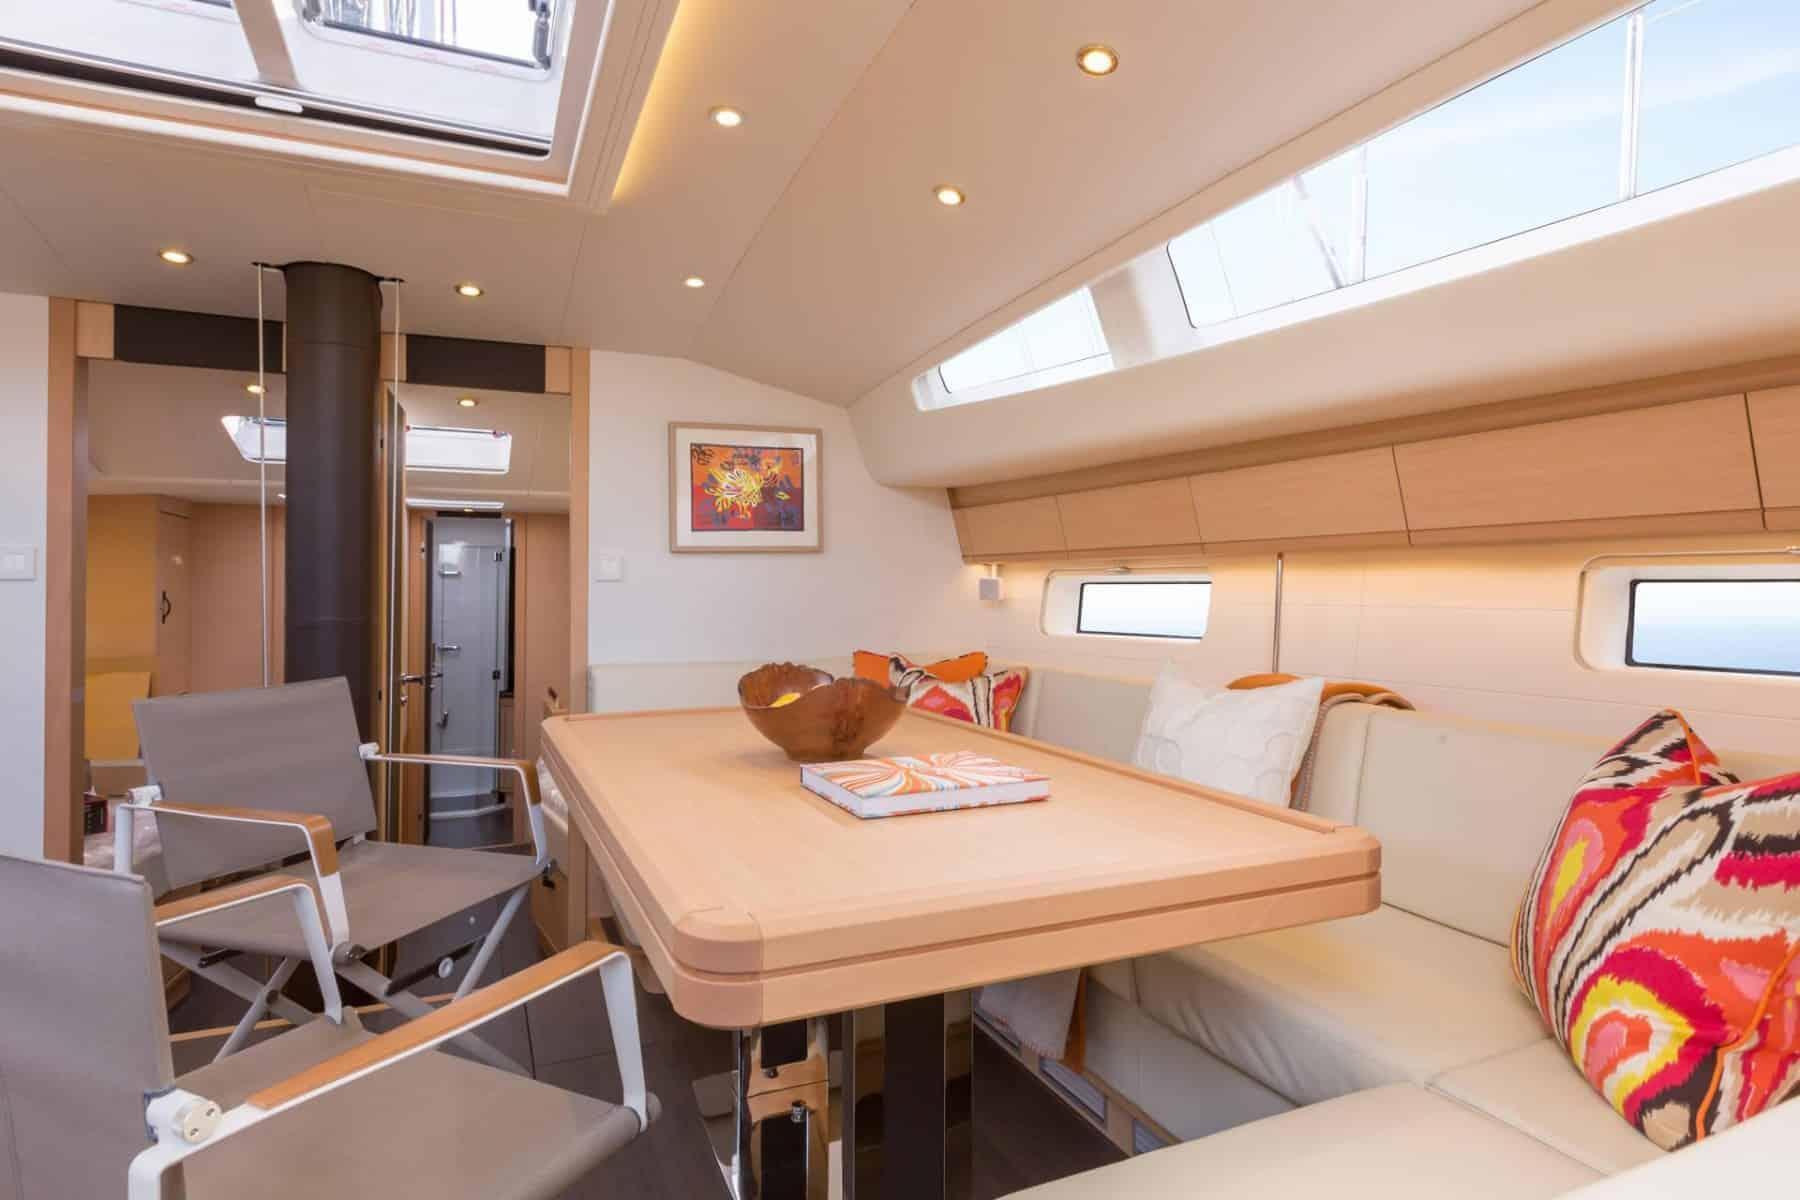 Jeanneau-64-interior-saloon-3-charter-ownership-yacht